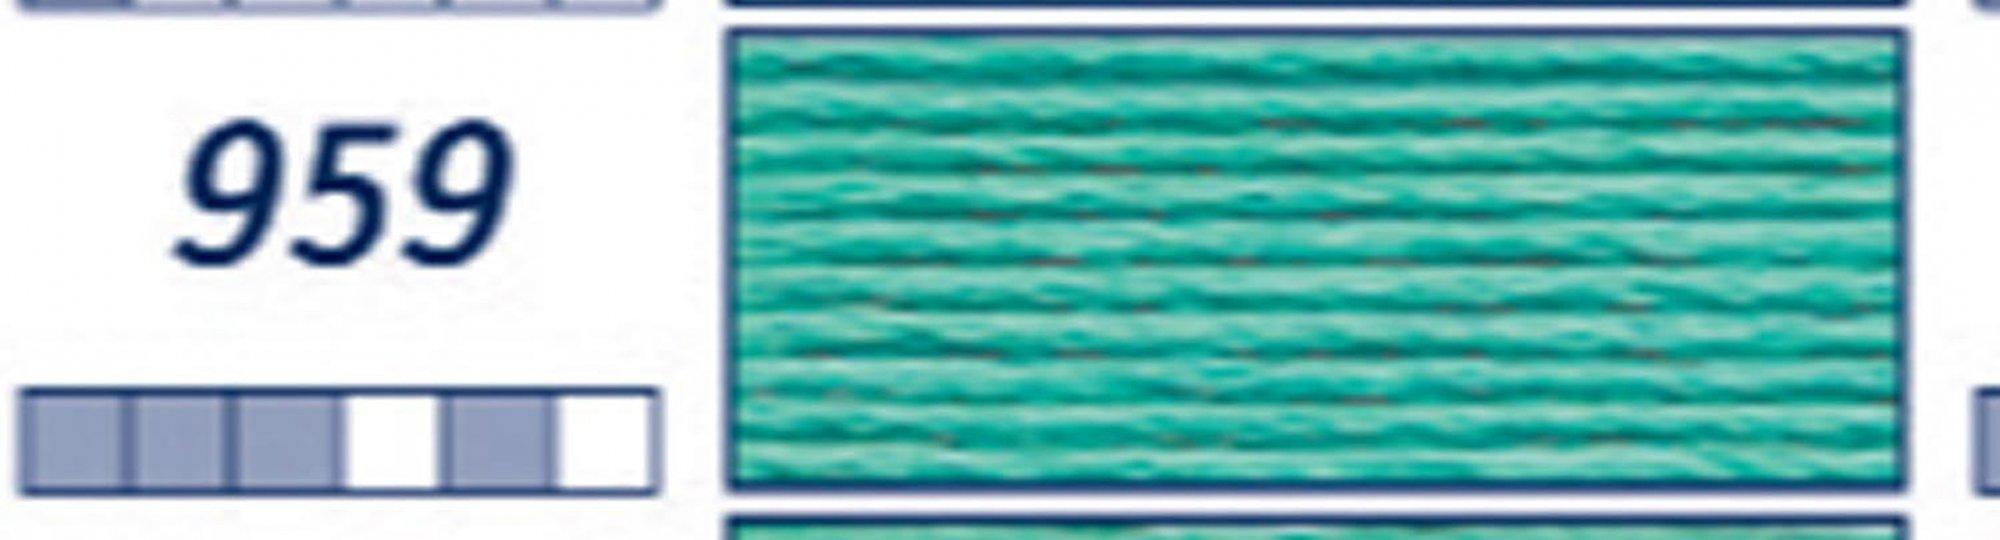 DP3-959-MD SEAGGREEN